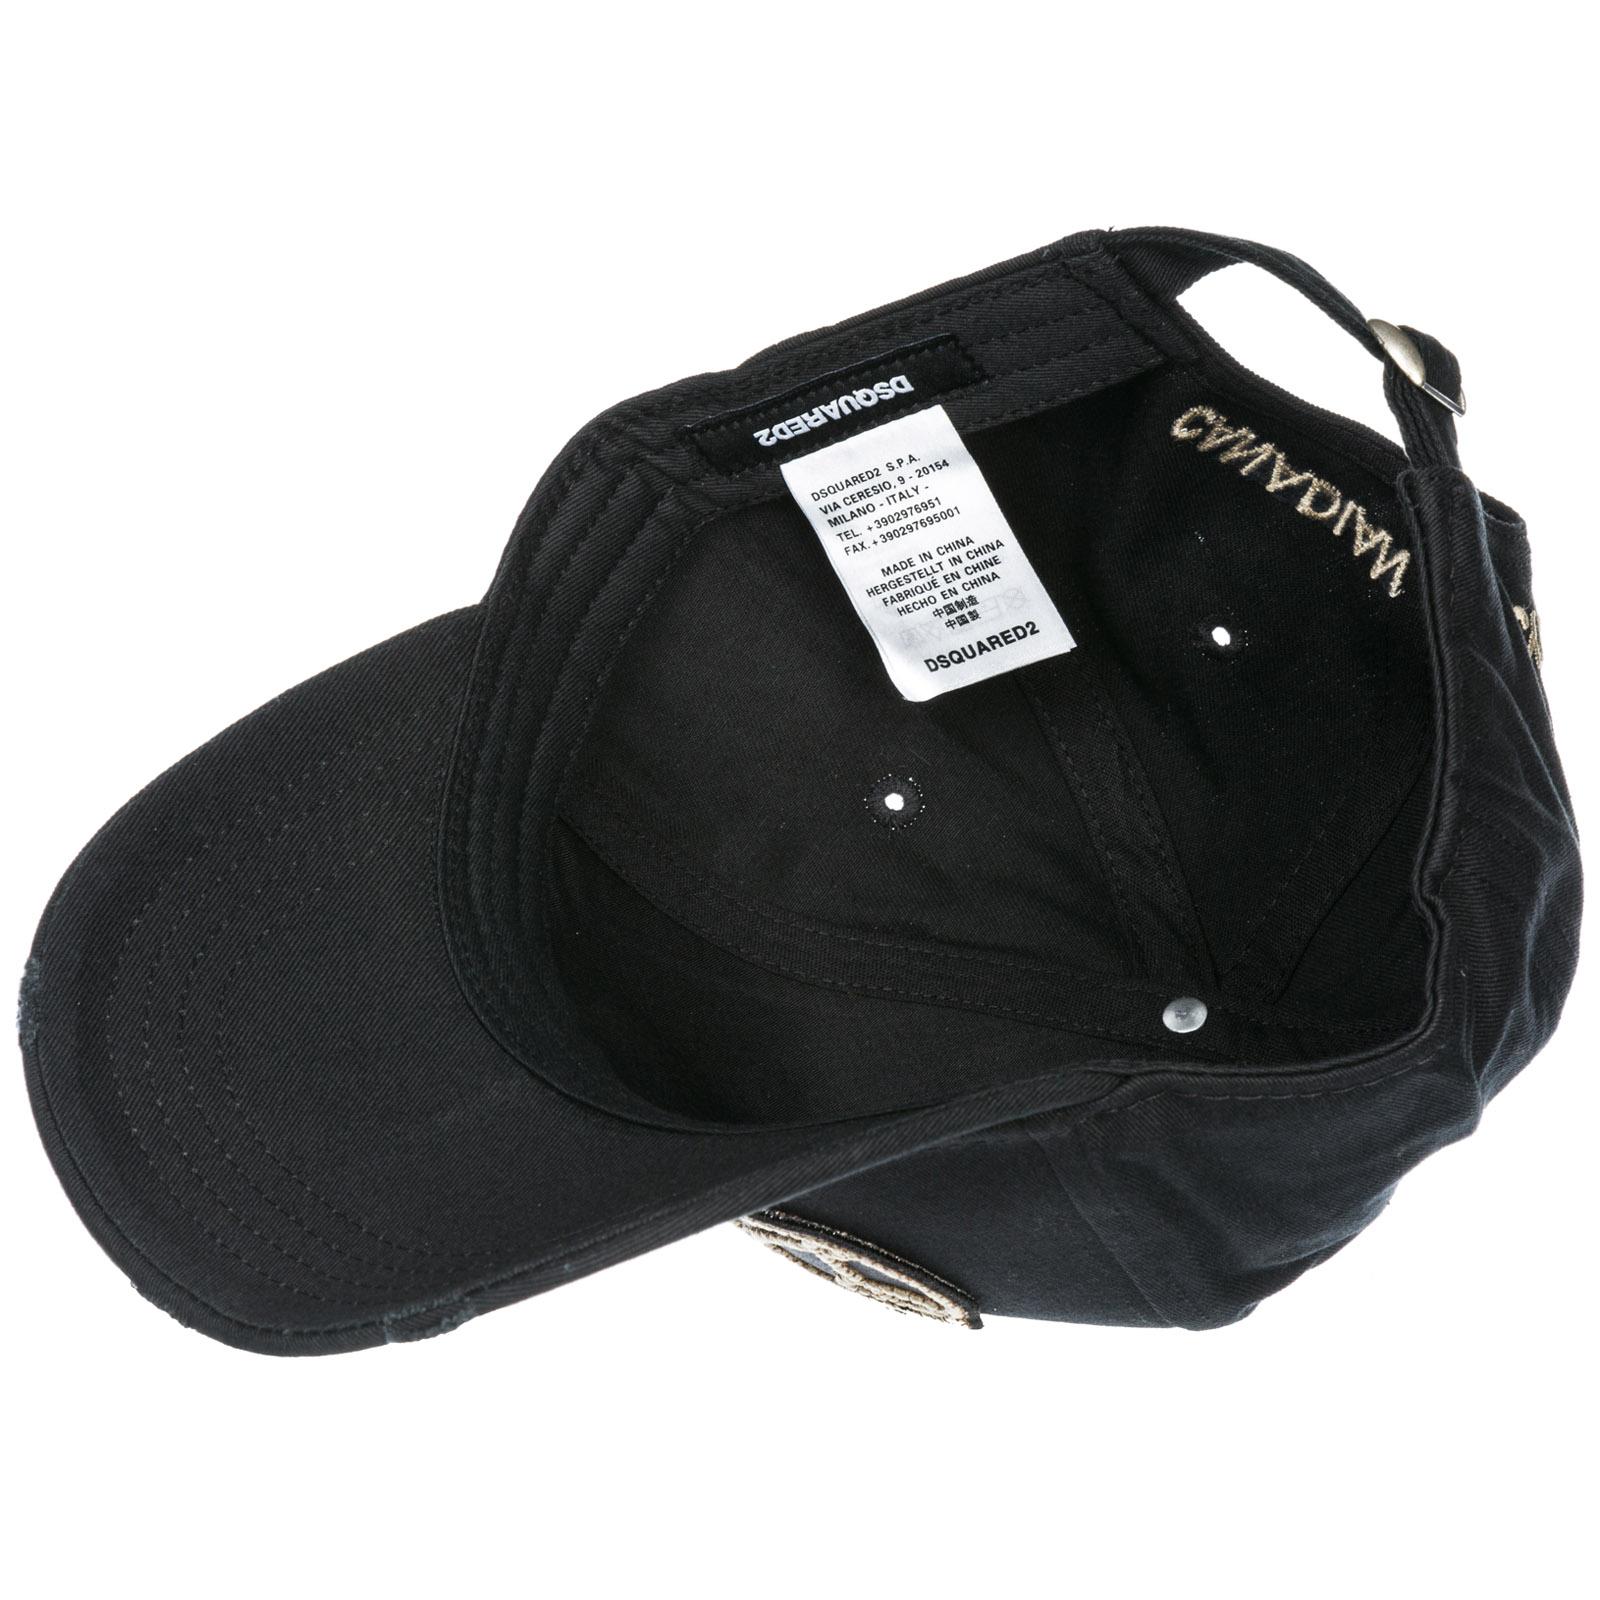 Cappello baseball Dsquared2 Cowboy BCM013605C000012124 nero  5b8cba456487